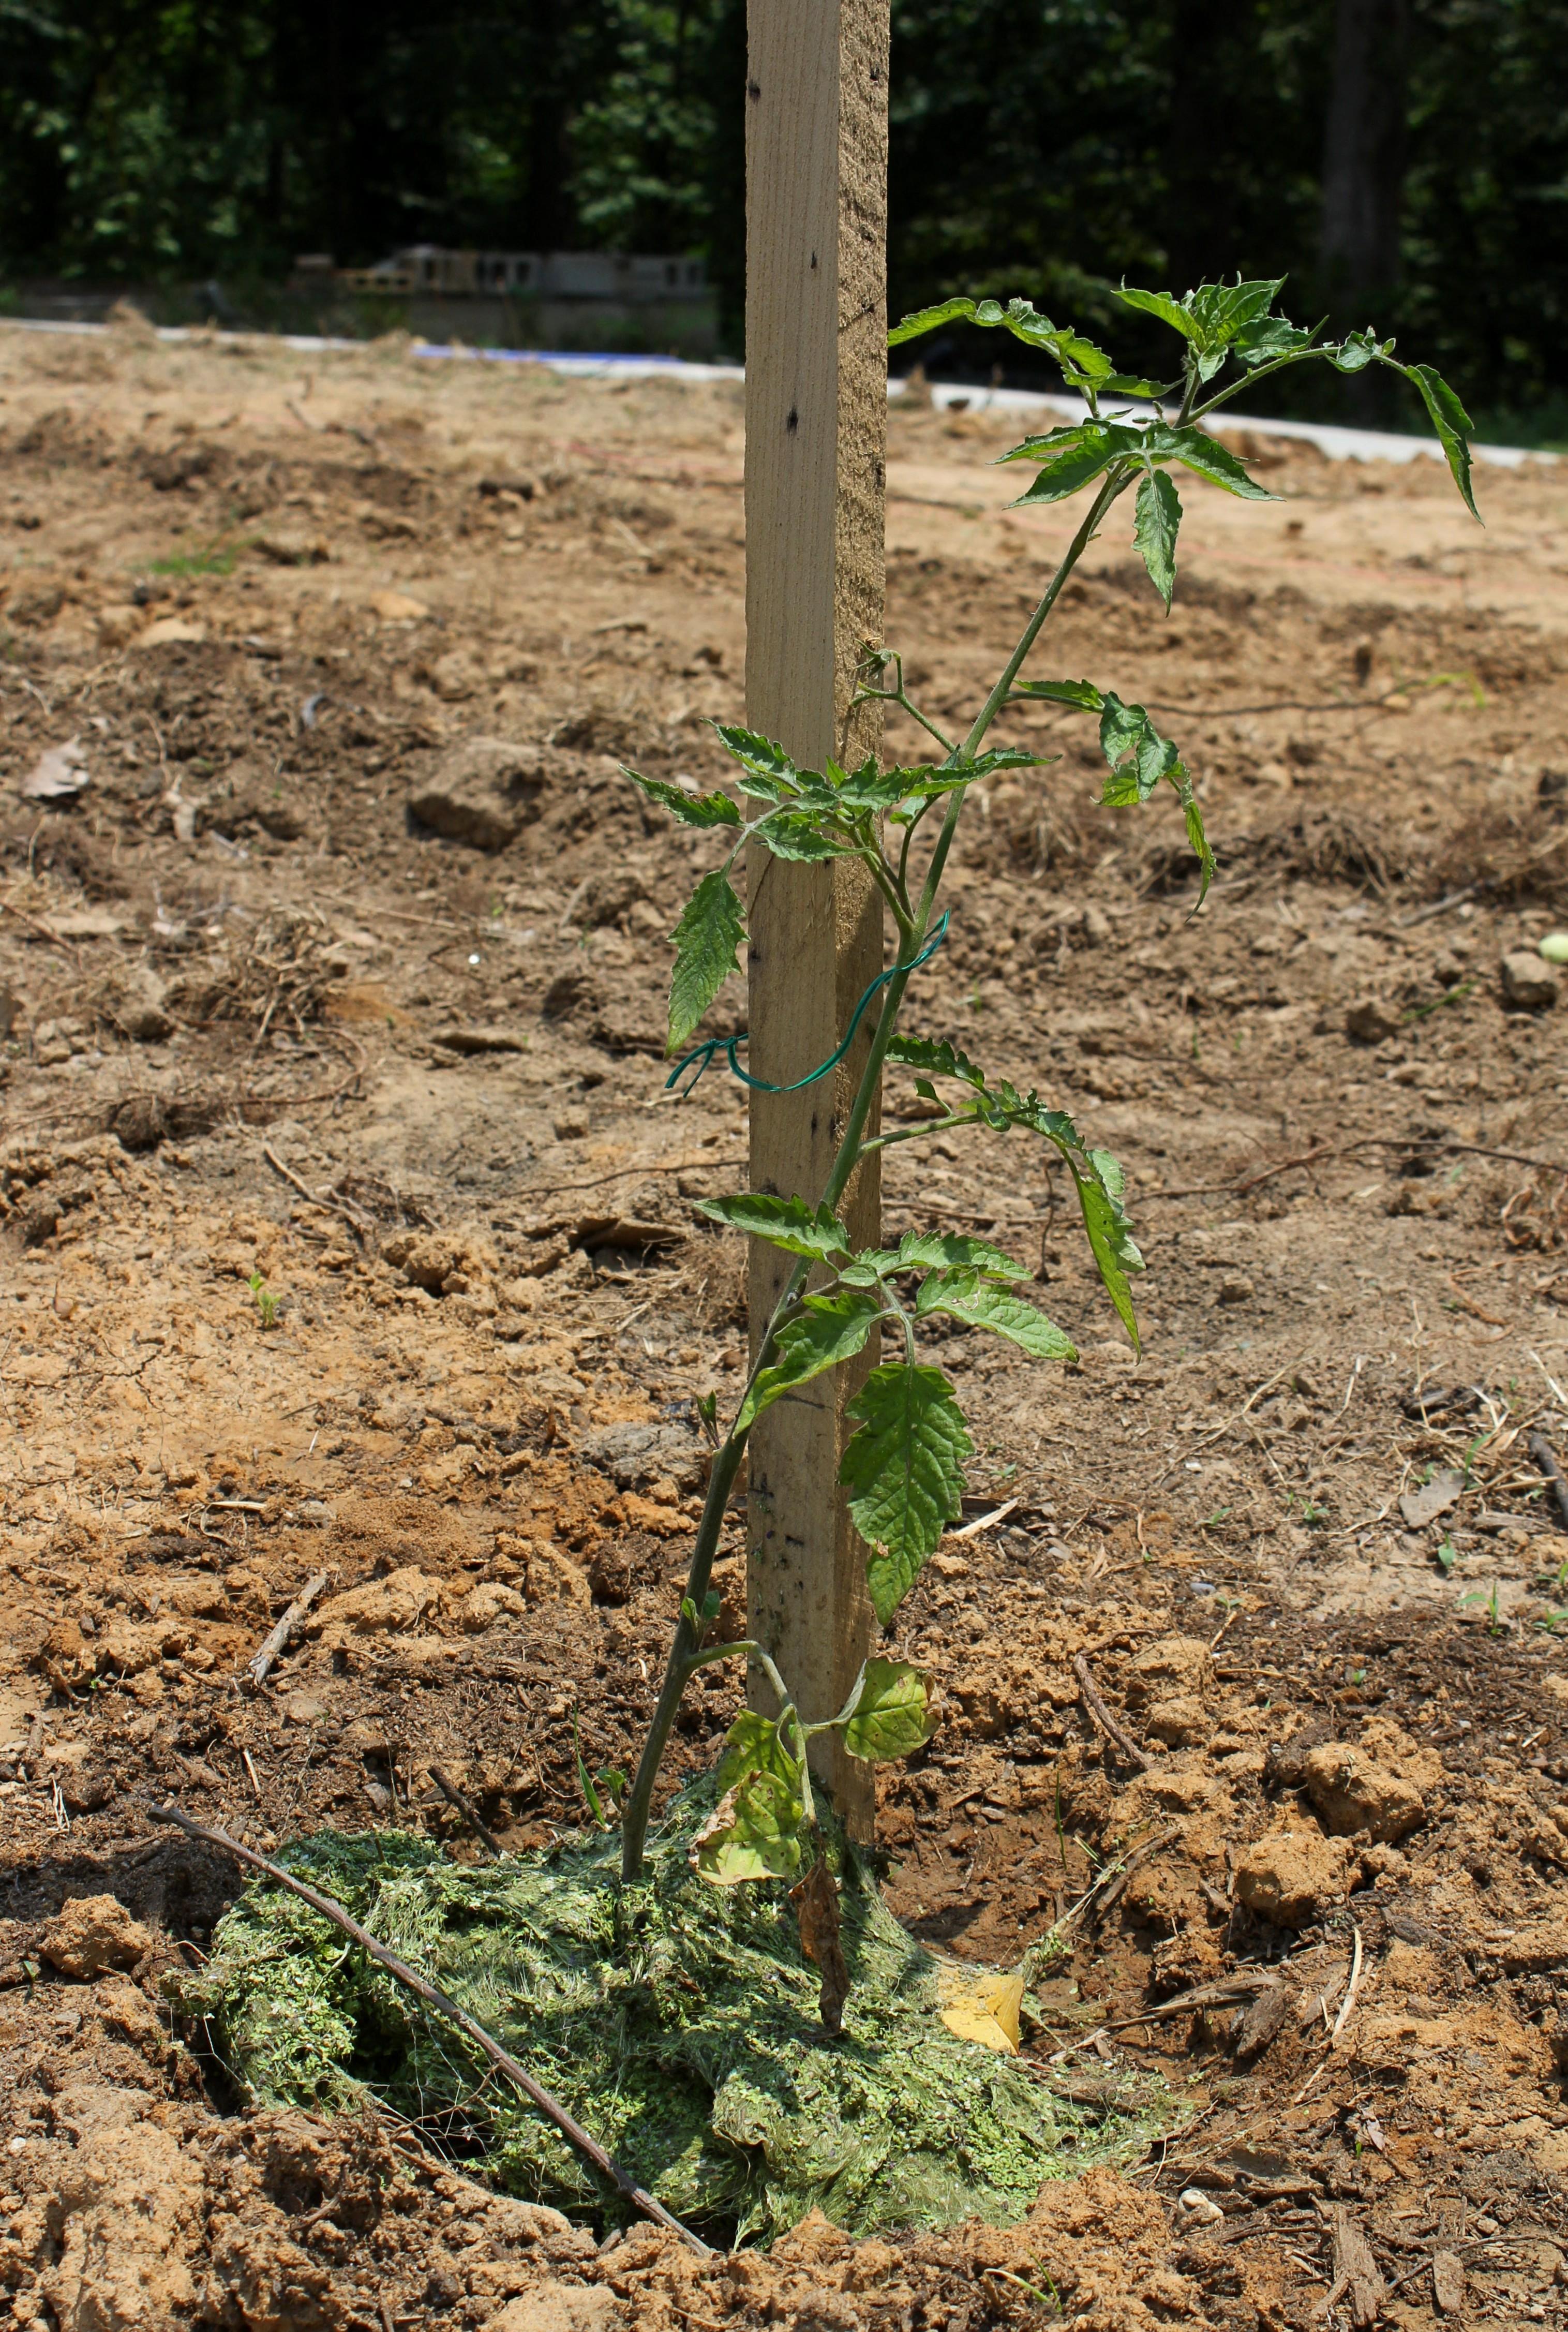 Green duckweed mulch to the rescue? | Duckweed Gardening